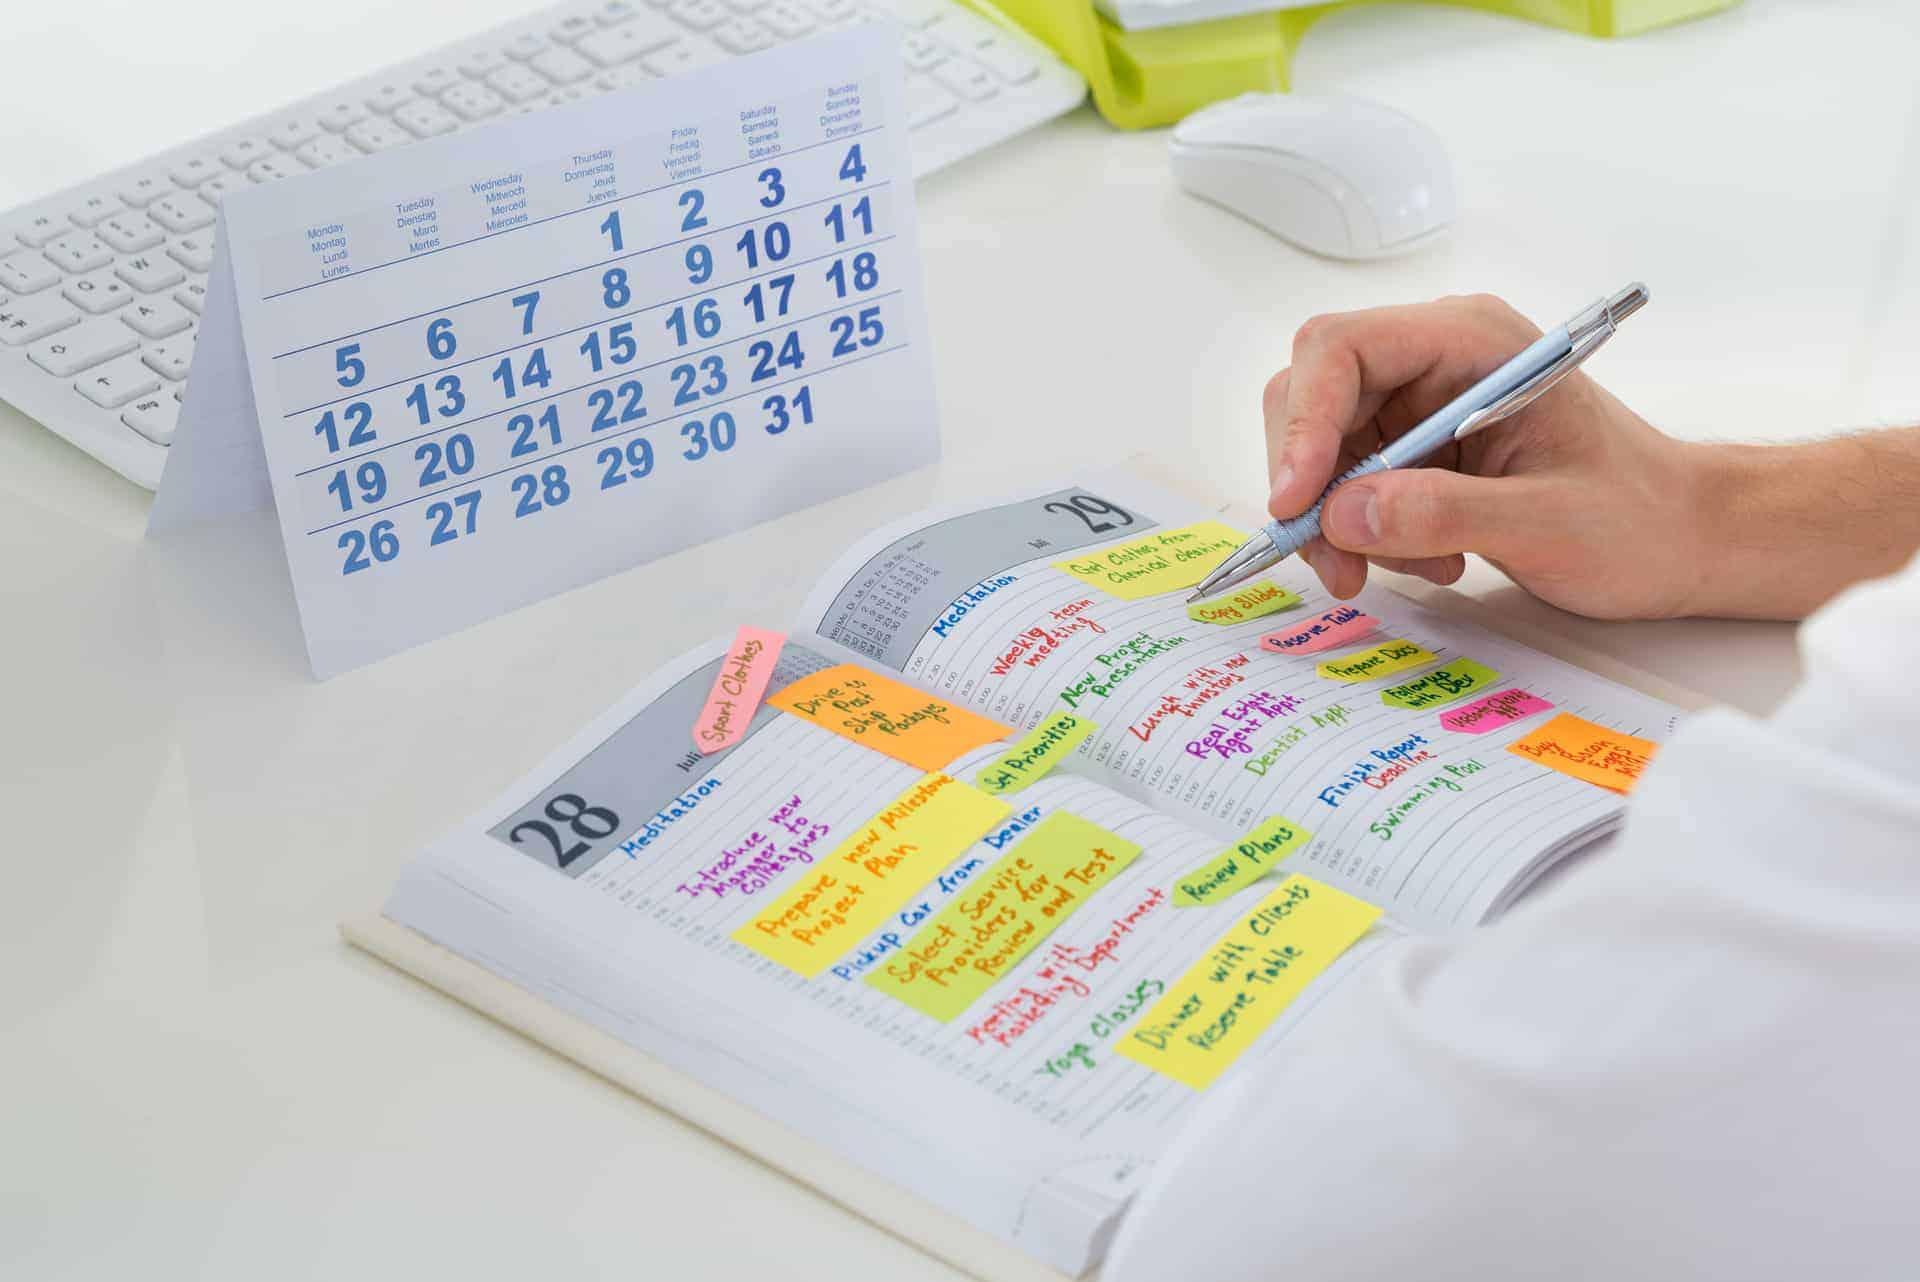 blog writing tips for seo